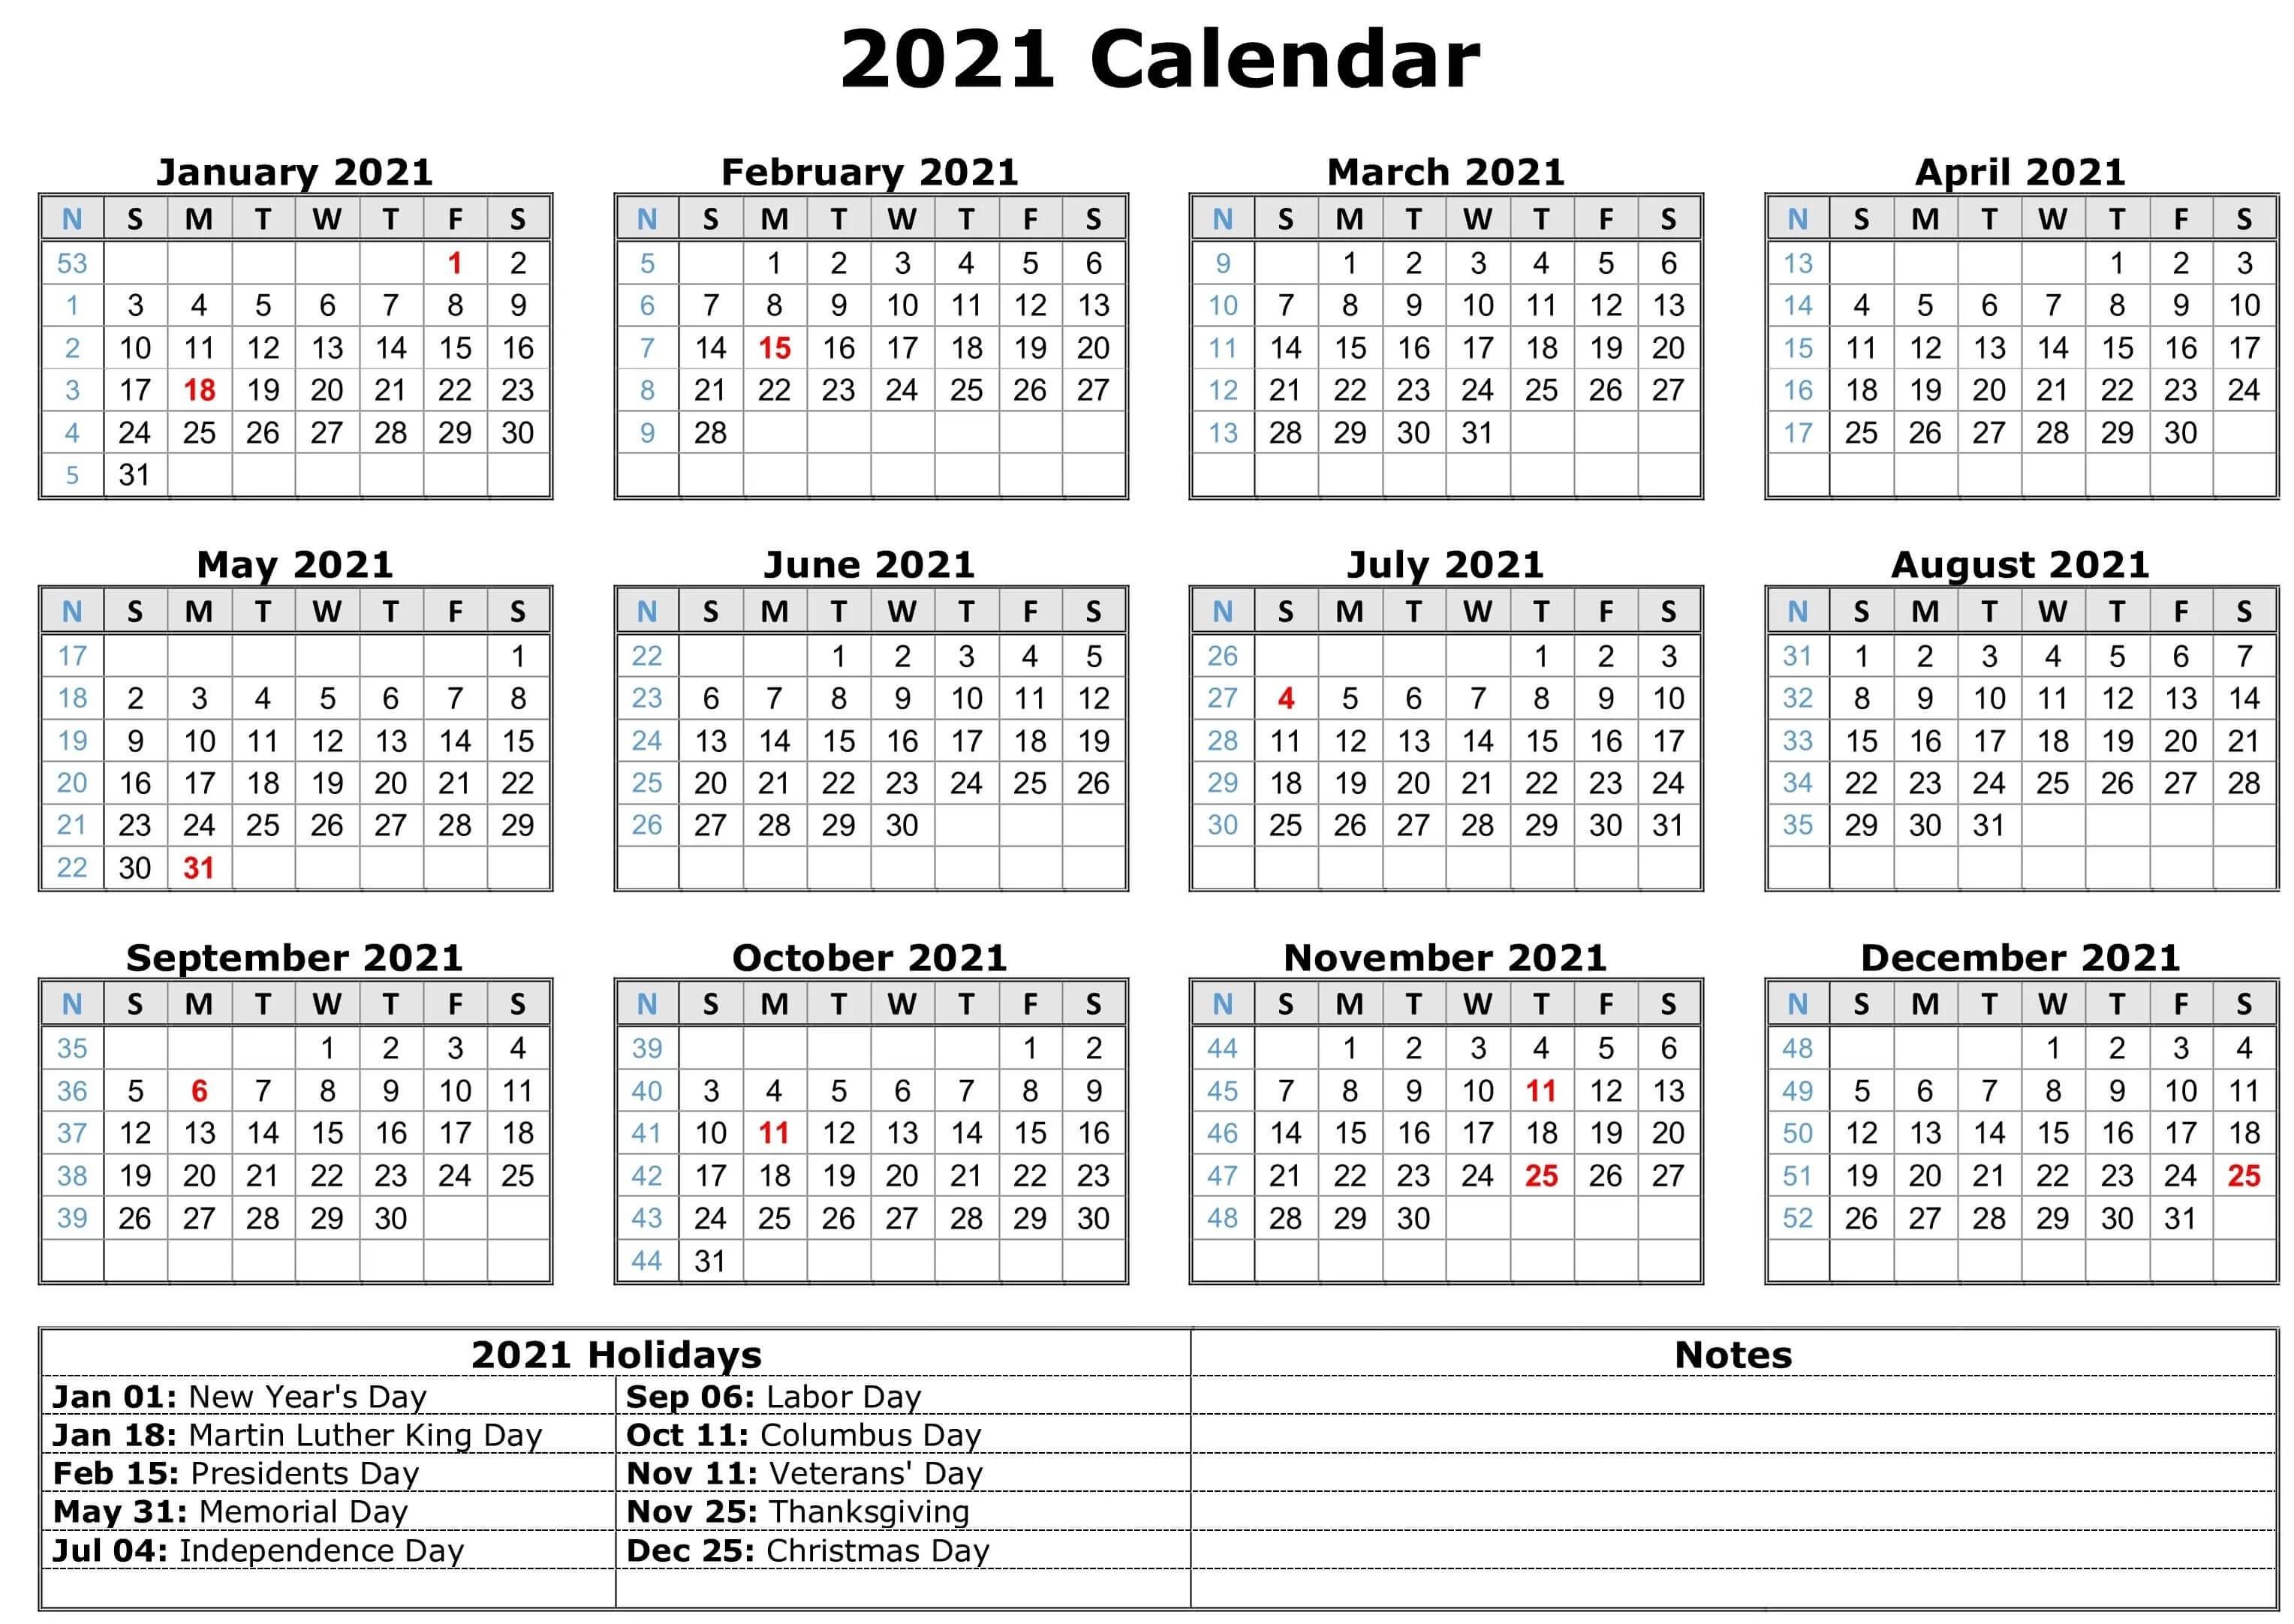 Jan 2021 · jan 2021. Free Yearly Printable Calendar 2021 with Holidays